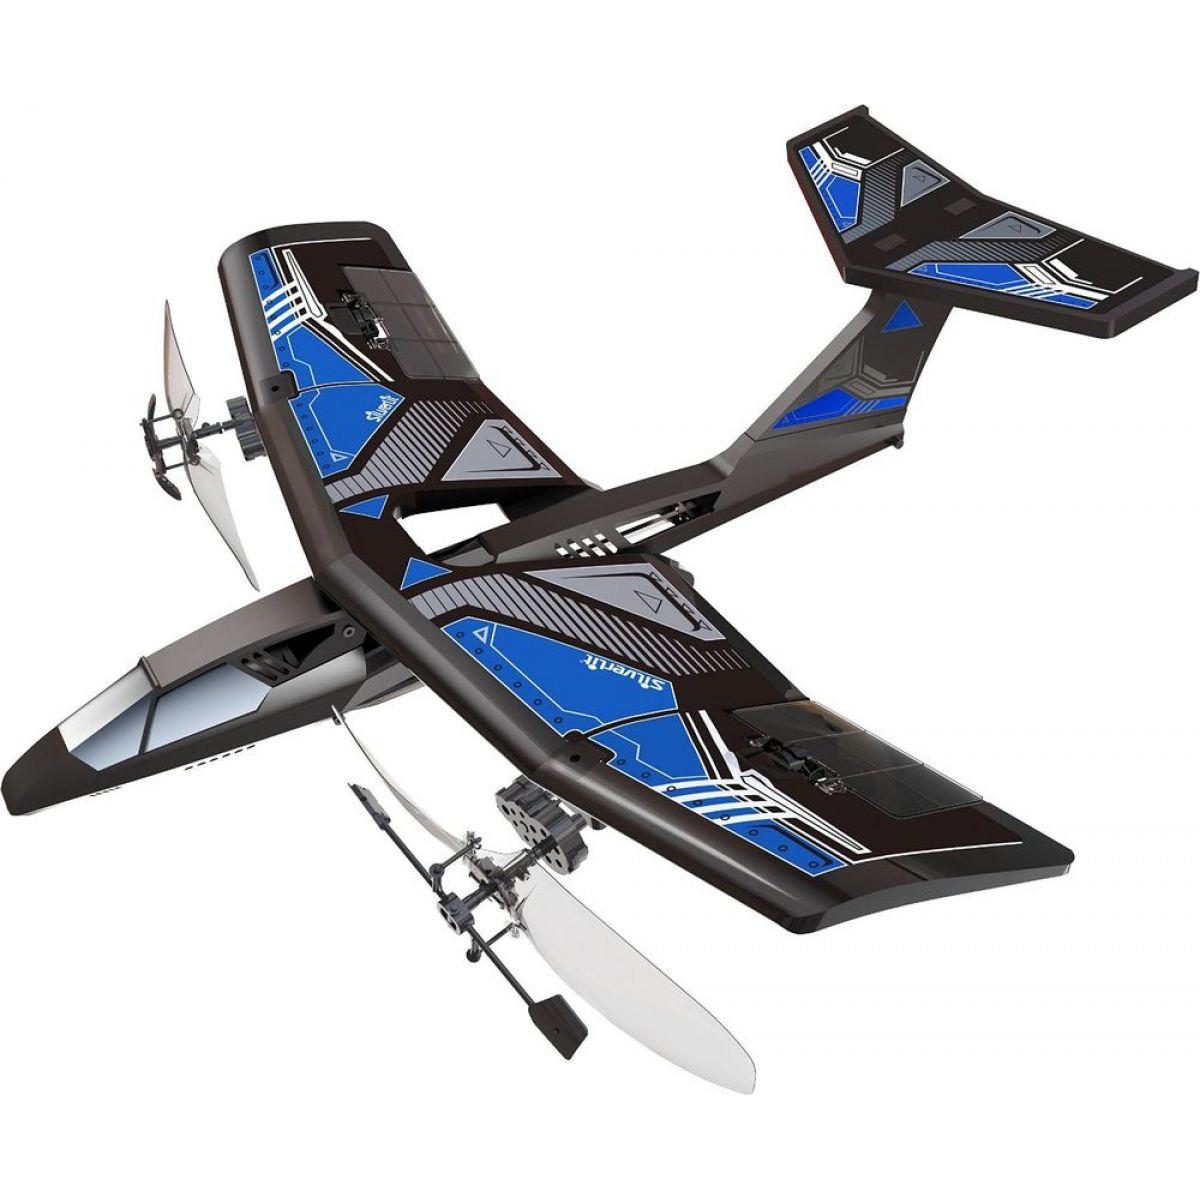 Silverlit RC Mini V-Jet Letadlo - Modrá